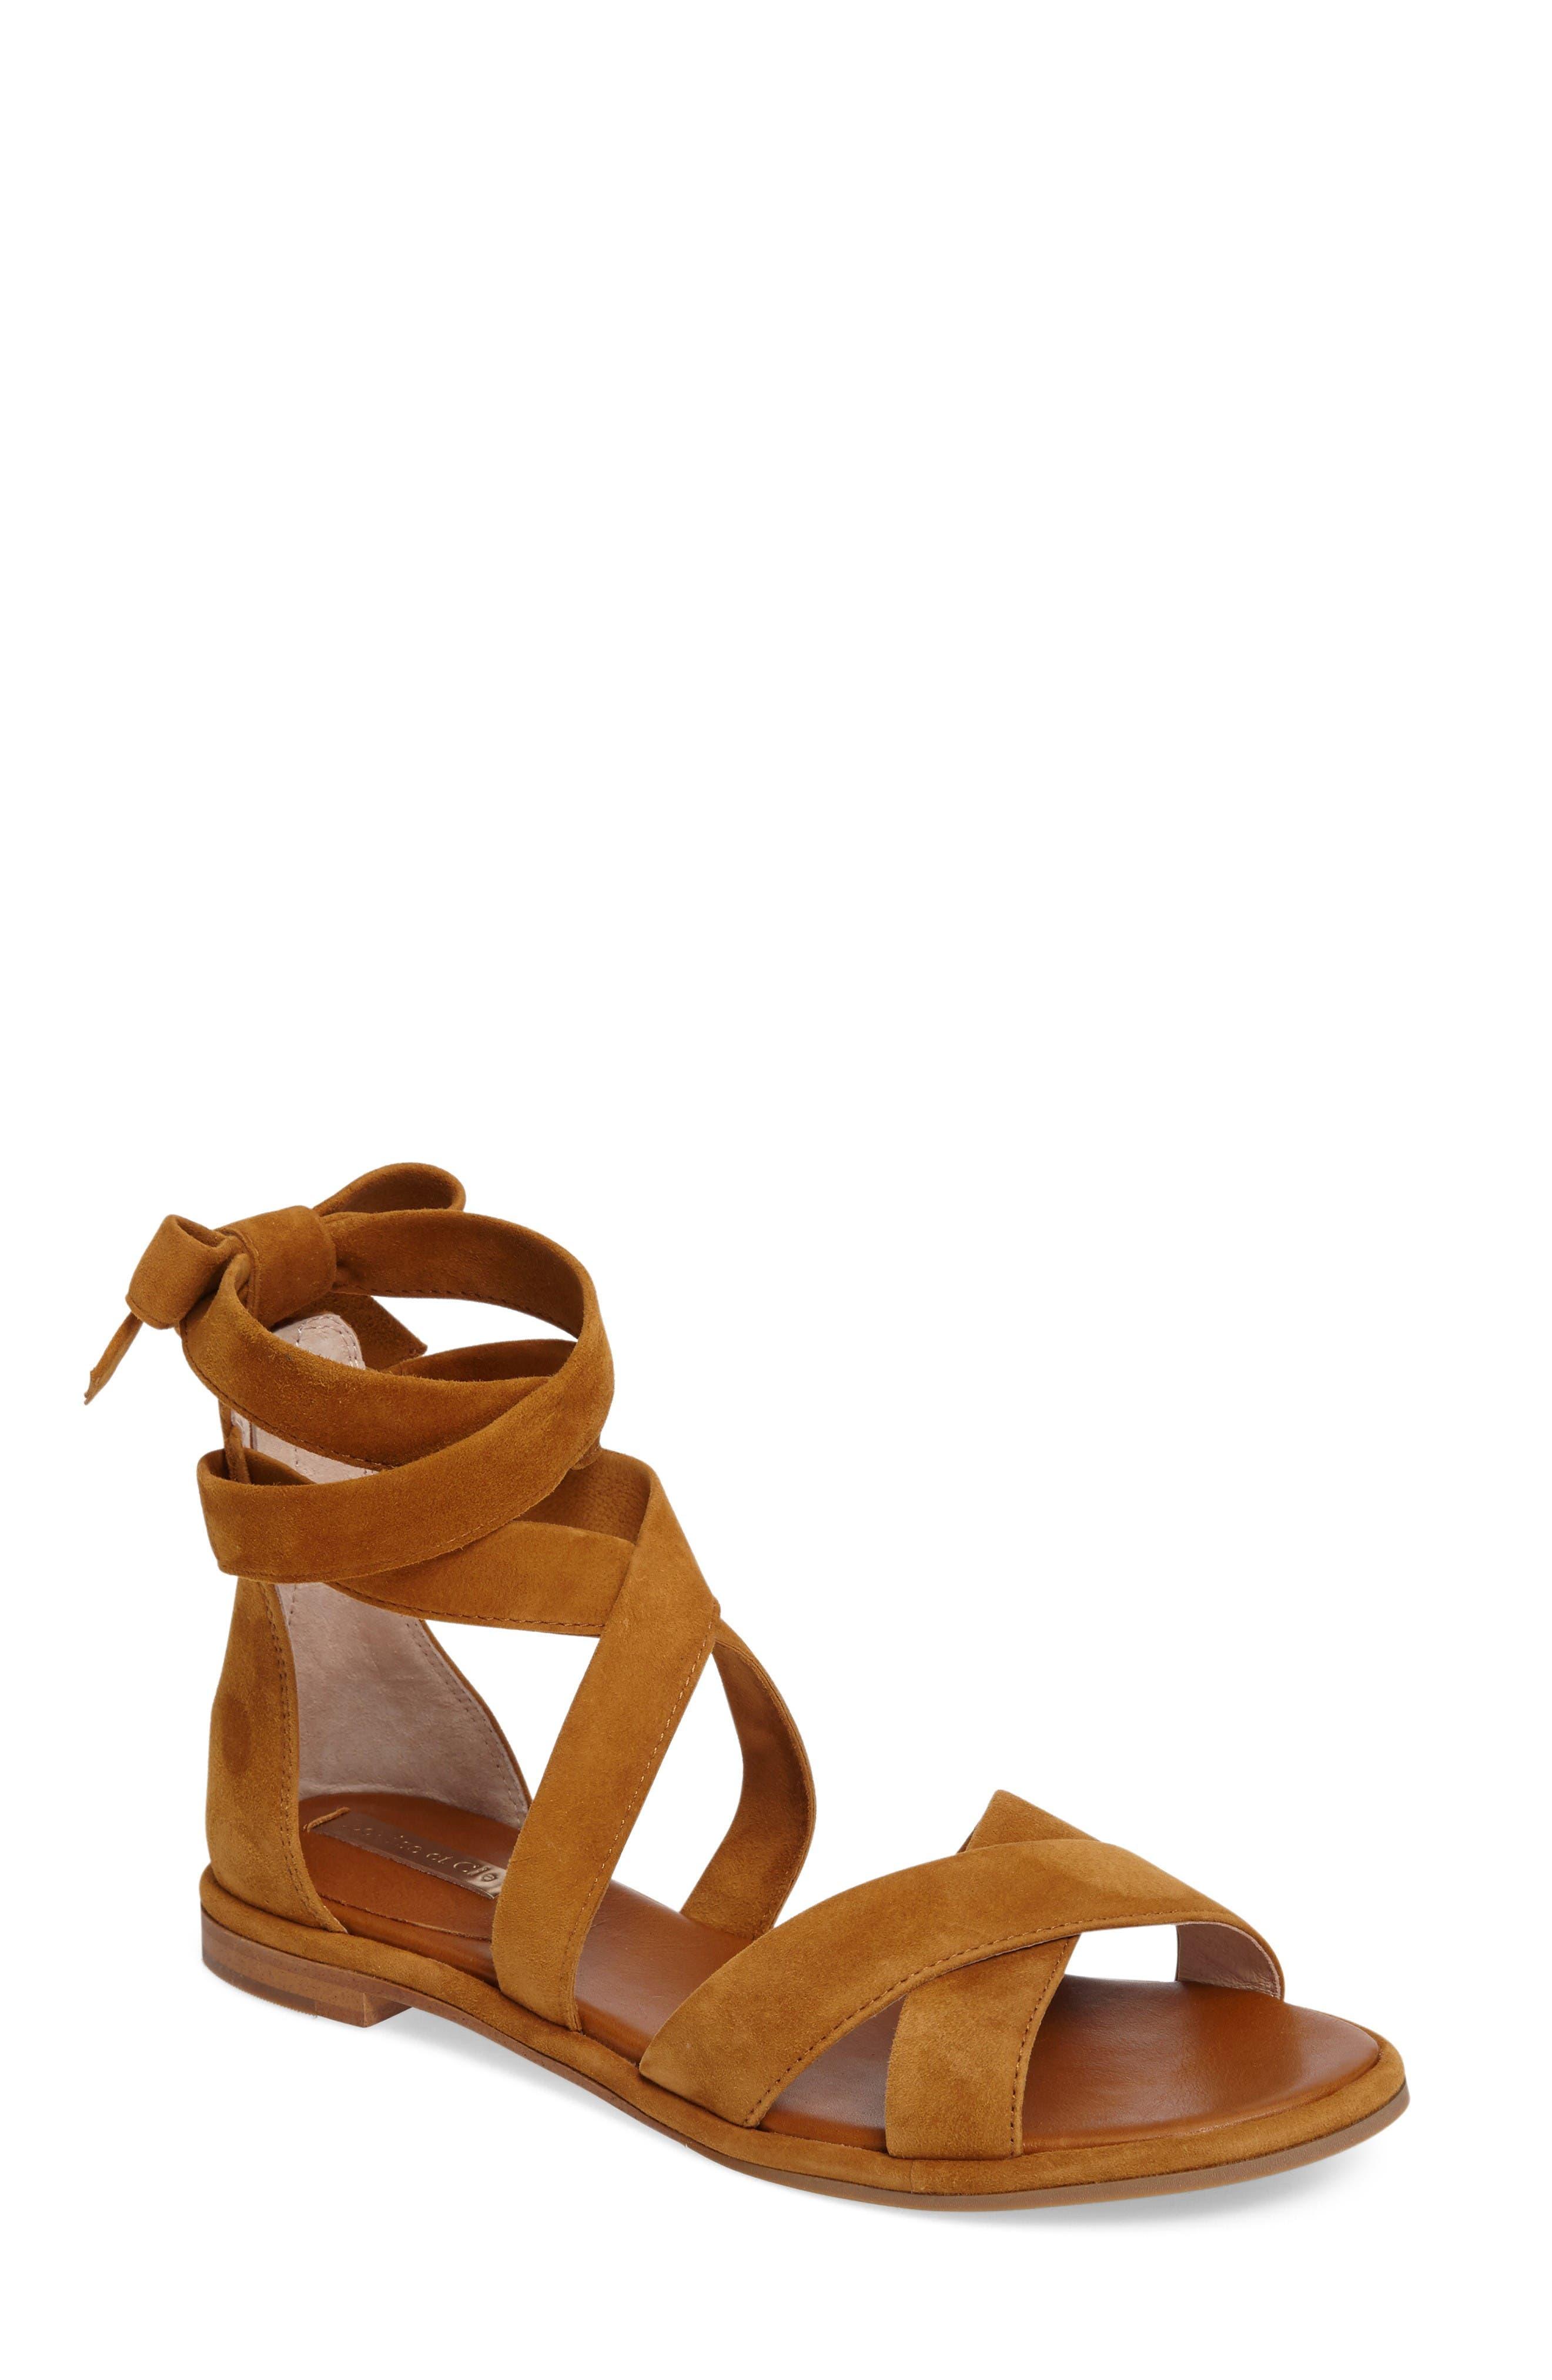 Alternate Image 1 Selected - Louise et Cie Clover Sandal (Women)